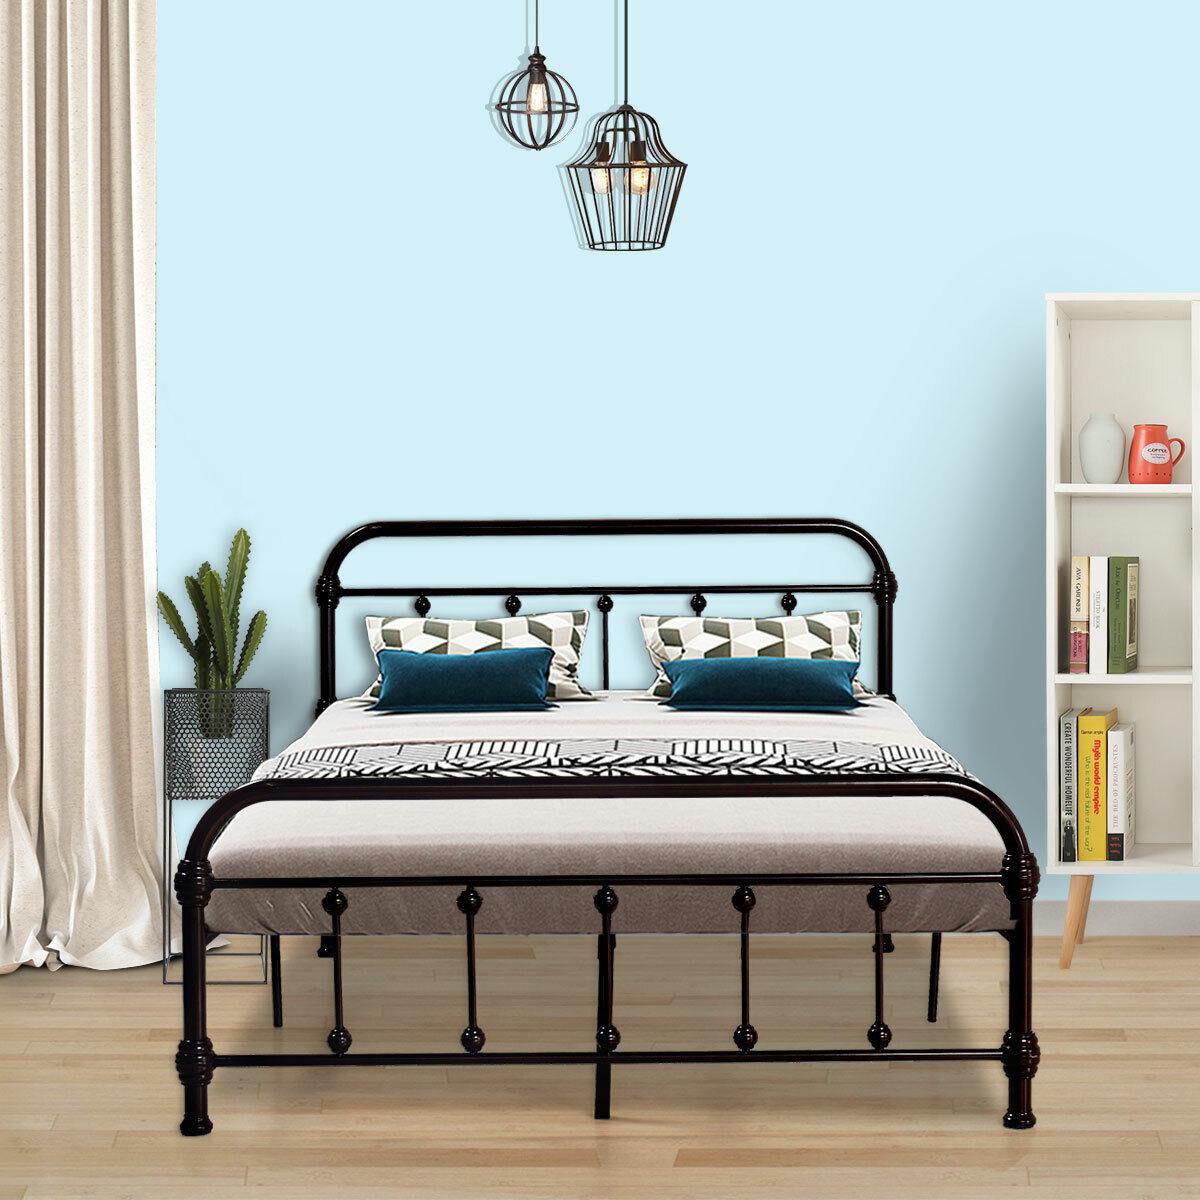 Full Size Metal Bed Frame Foundation Platform with Headboard